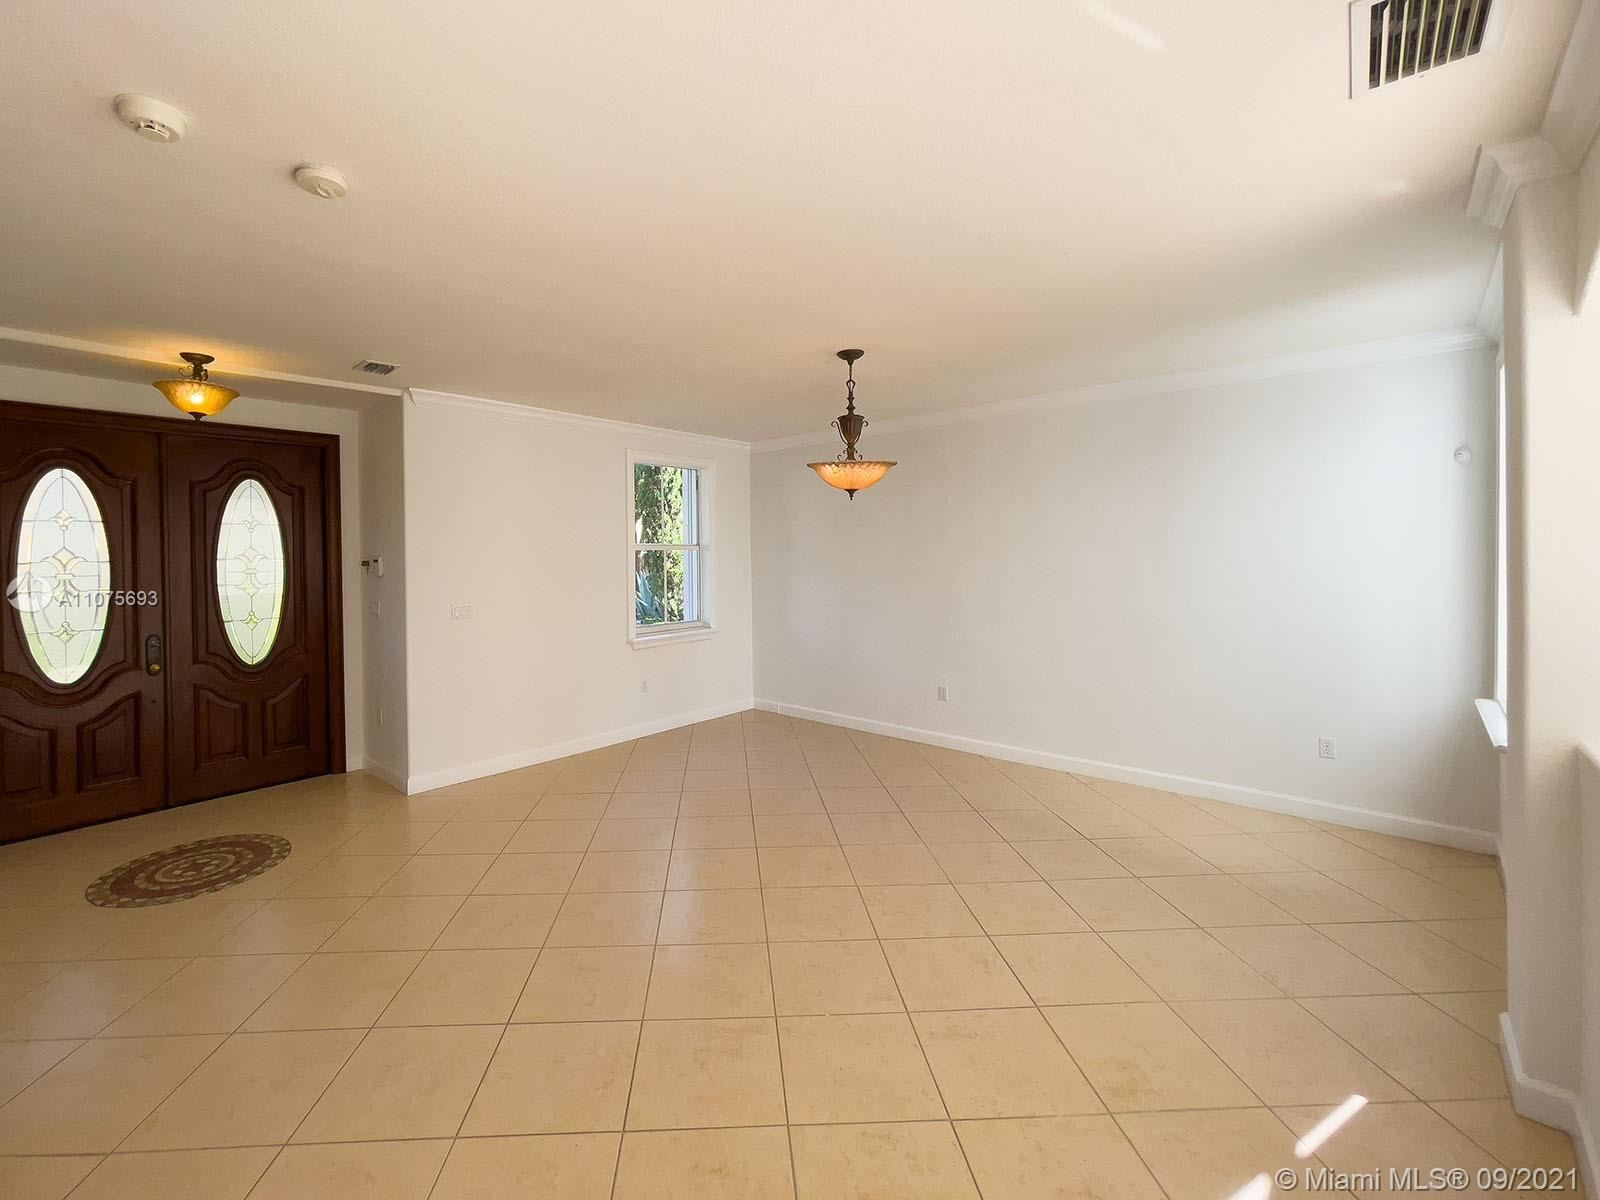 Photo of 14990 SW 10th St, Miami, FL 33194 (MLS # A11075693)